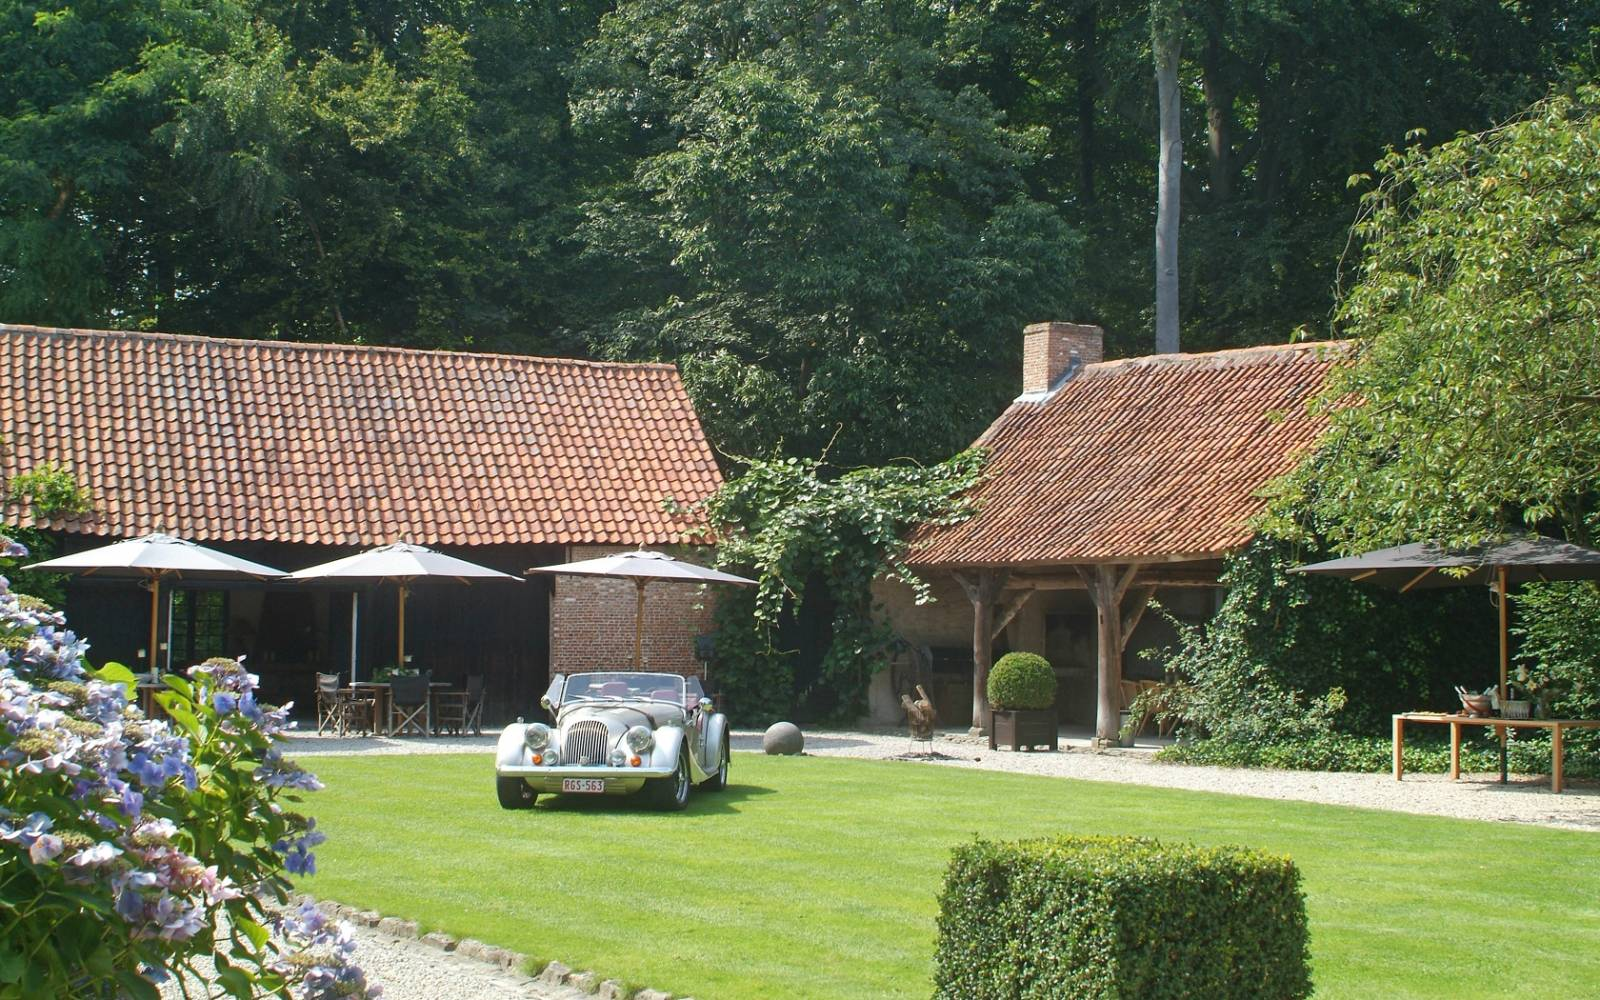 Flinckheuvel - House of Weddings-08